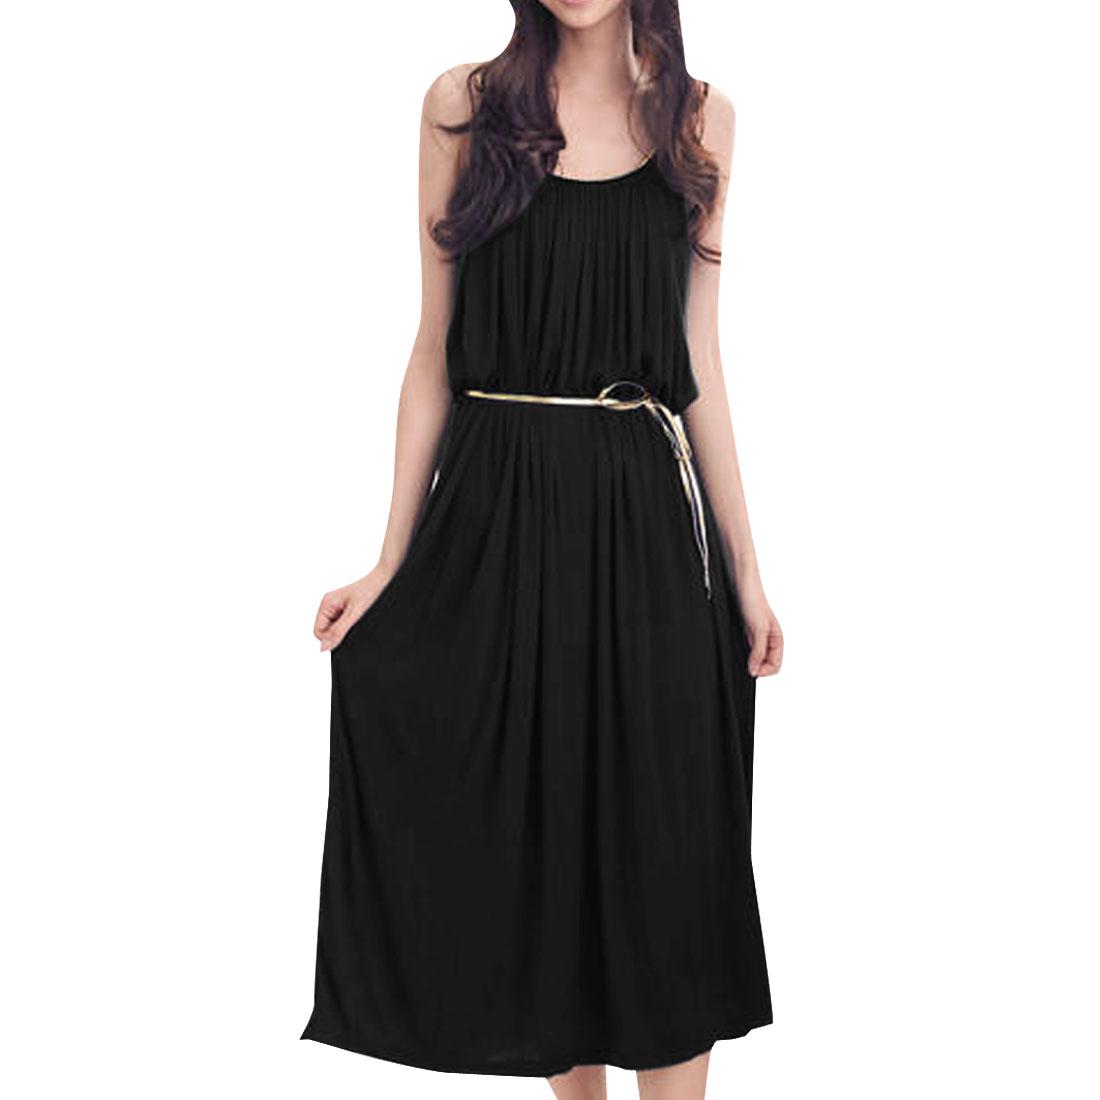 Ladies Sleeveless Braided Spaghetti Strap Tunic Dress Black S